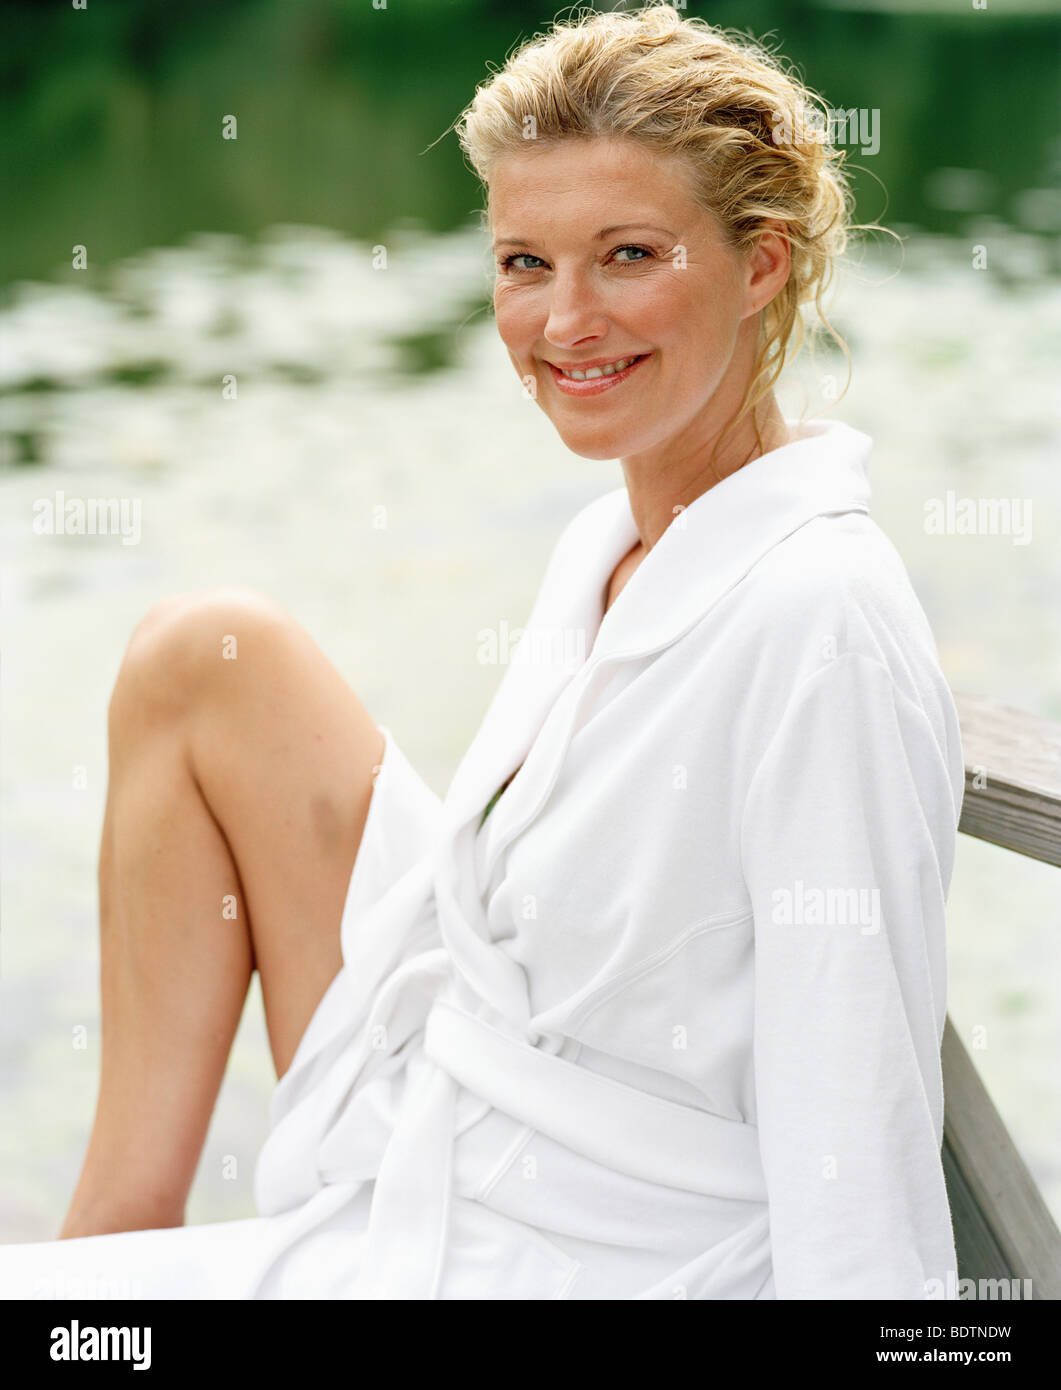 A smiling woman wearing a bathrobe - Stock Image